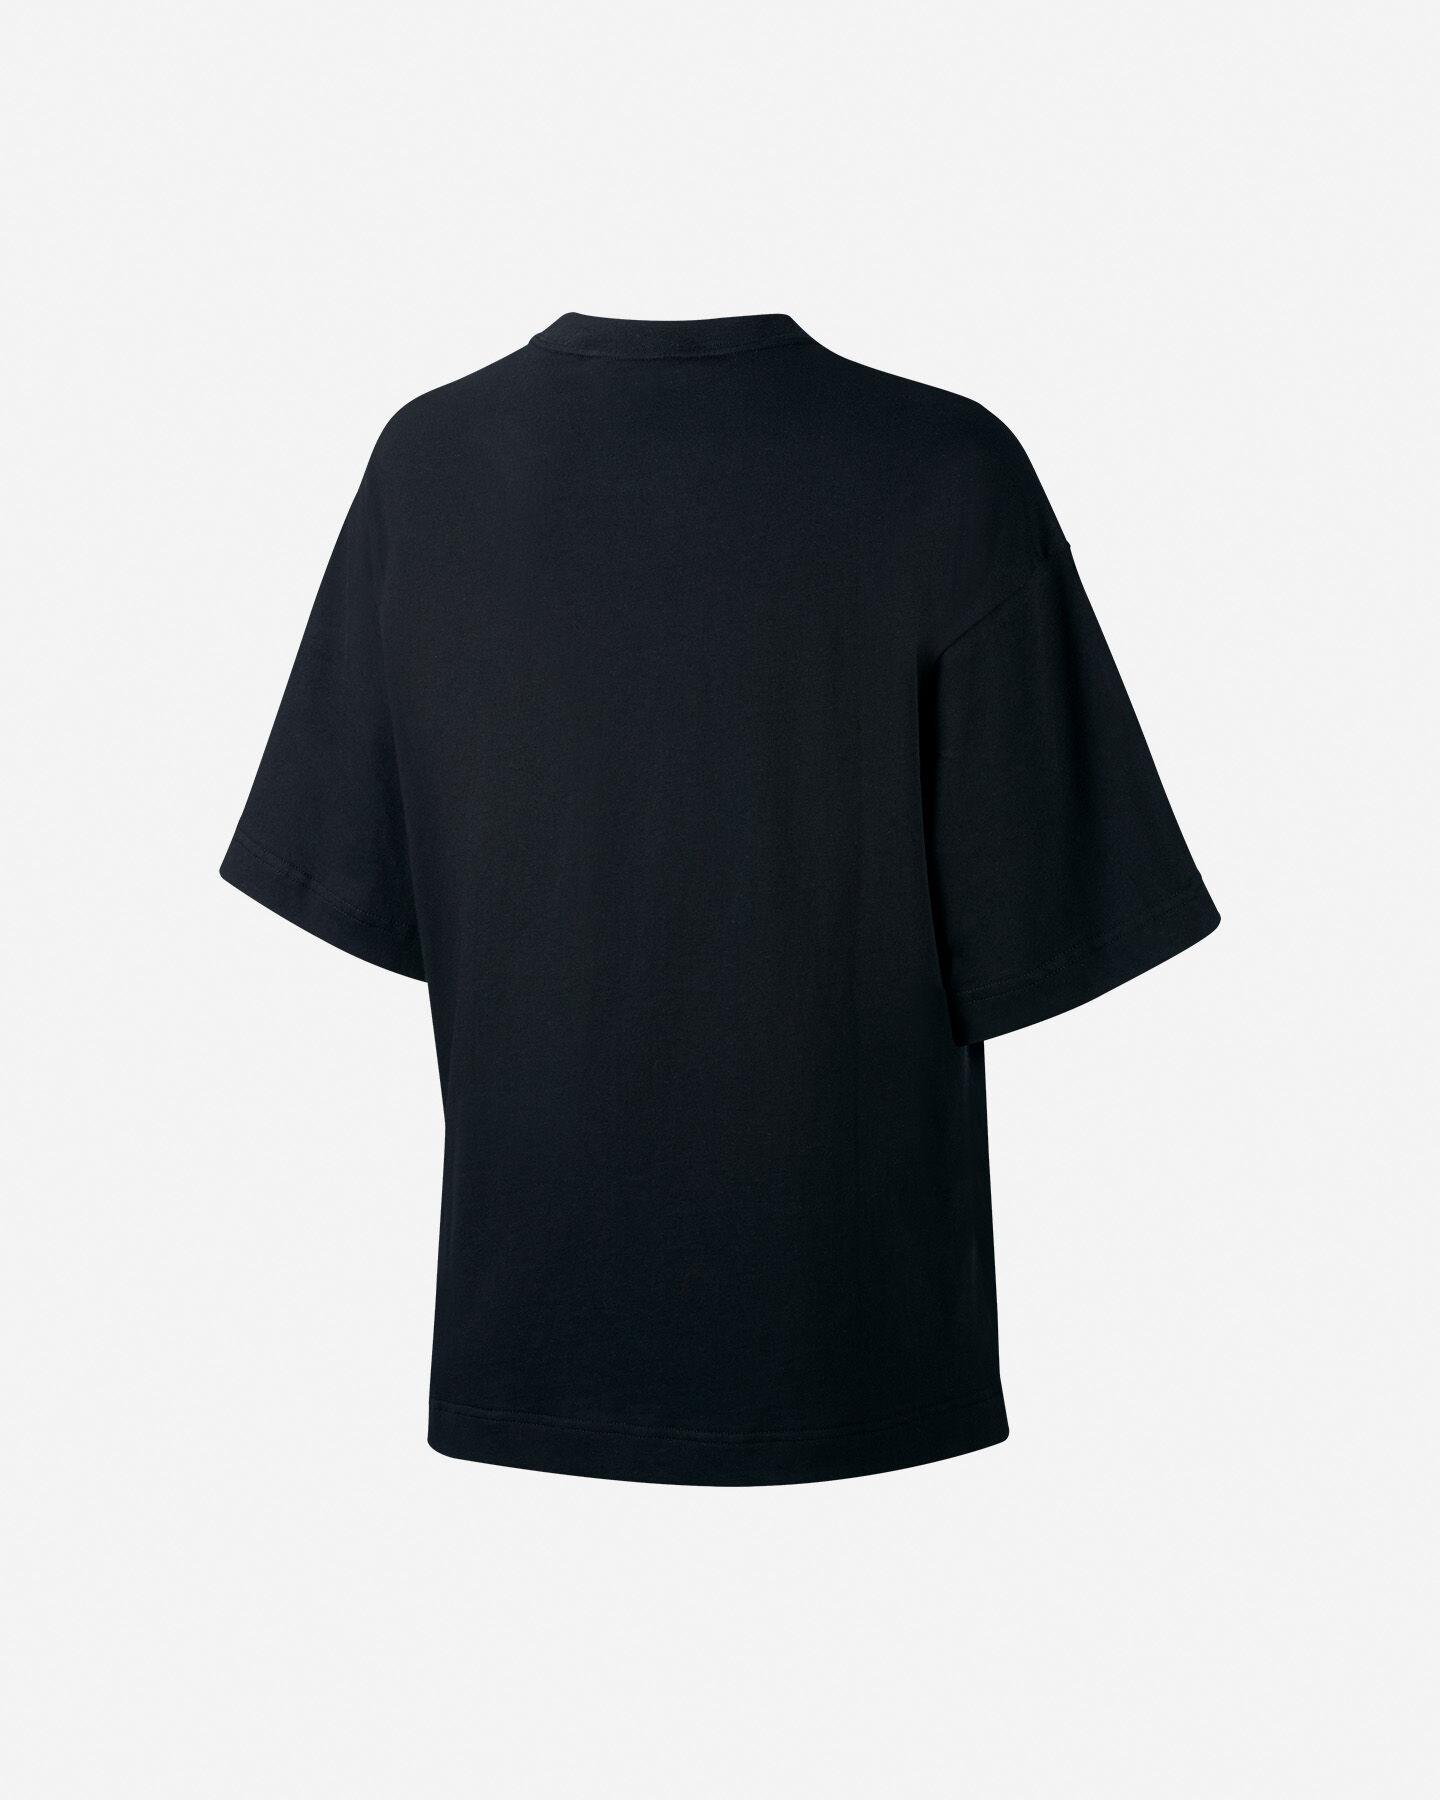 T-Shirt NIKE AIR BIG LOGO W S5164100 scatto 1